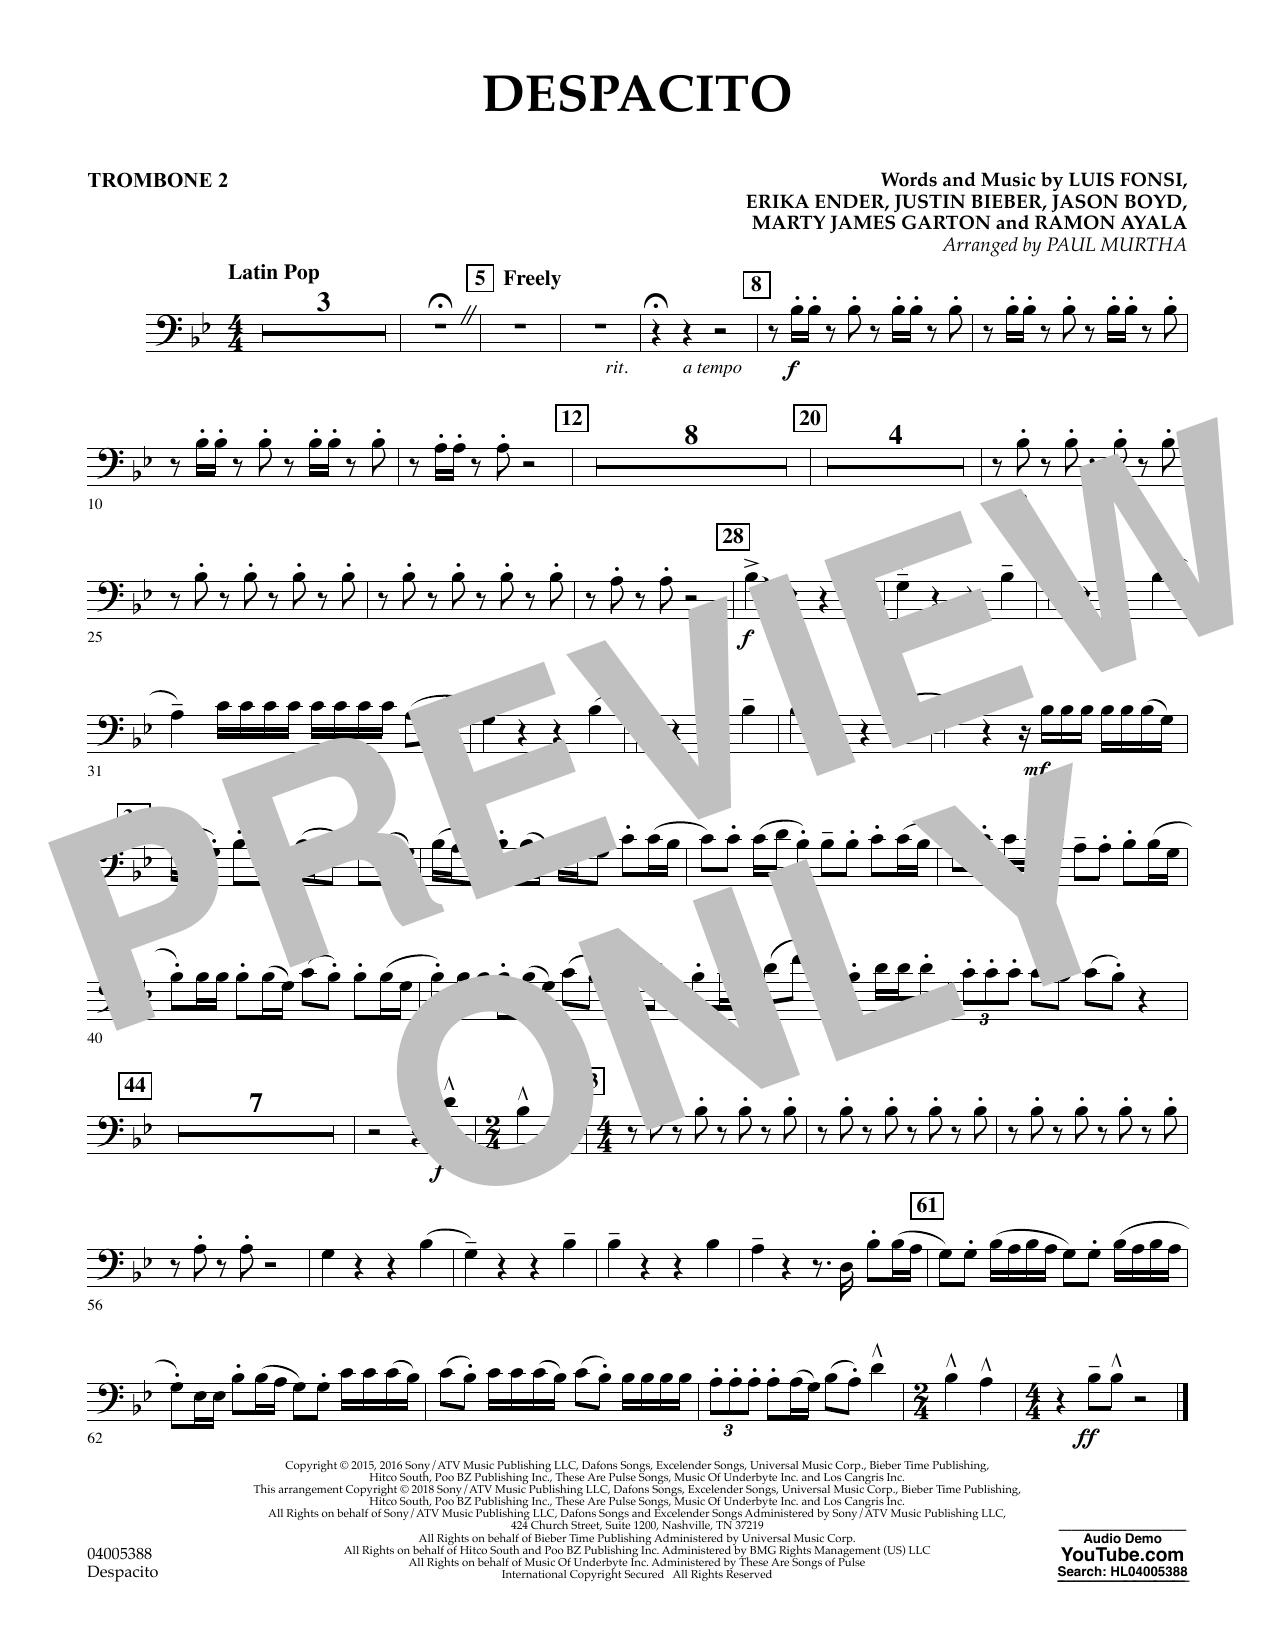 Luis Fonsi & Daddy Yankee feat. Justin Bieber Despacito (arr. Paul Murtha) - Trombone 2 sheet music notes printable PDF score